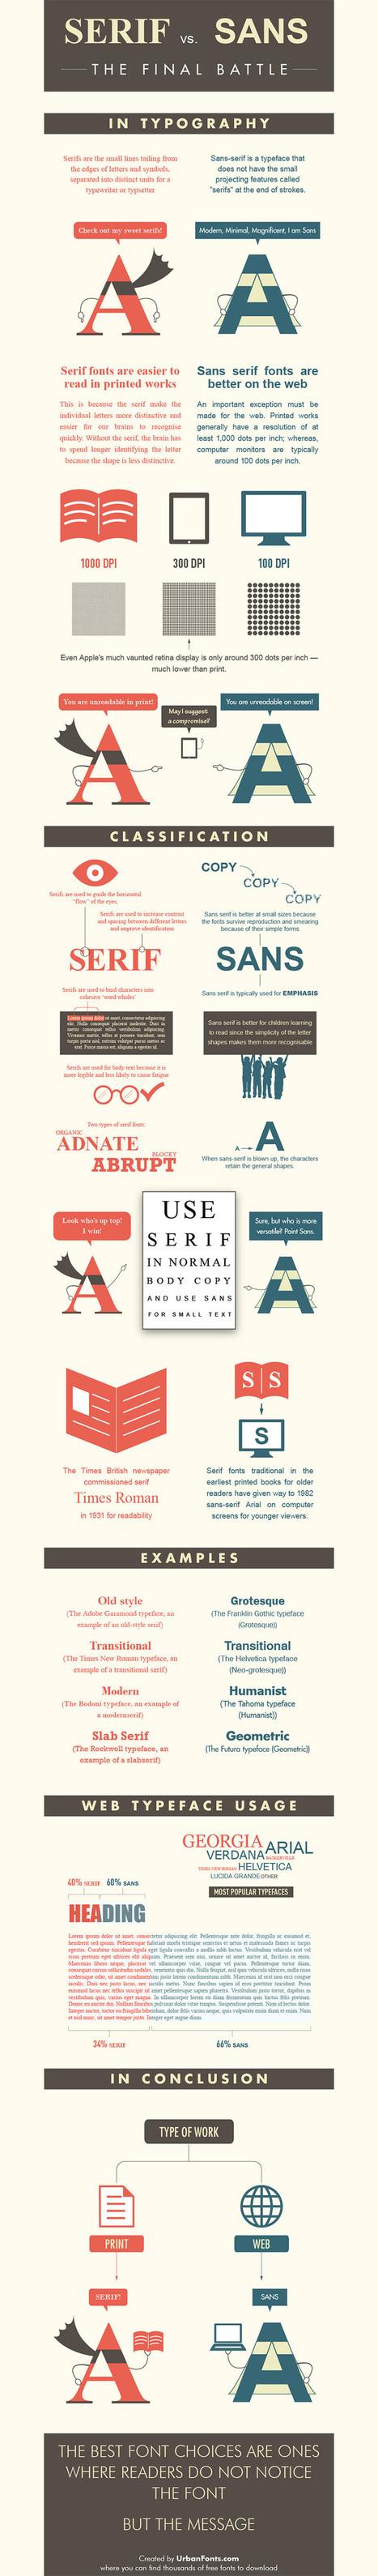 serif-vs-sans-serif.jpg (782x5323 pixels) | Digital Society | Scoop.it